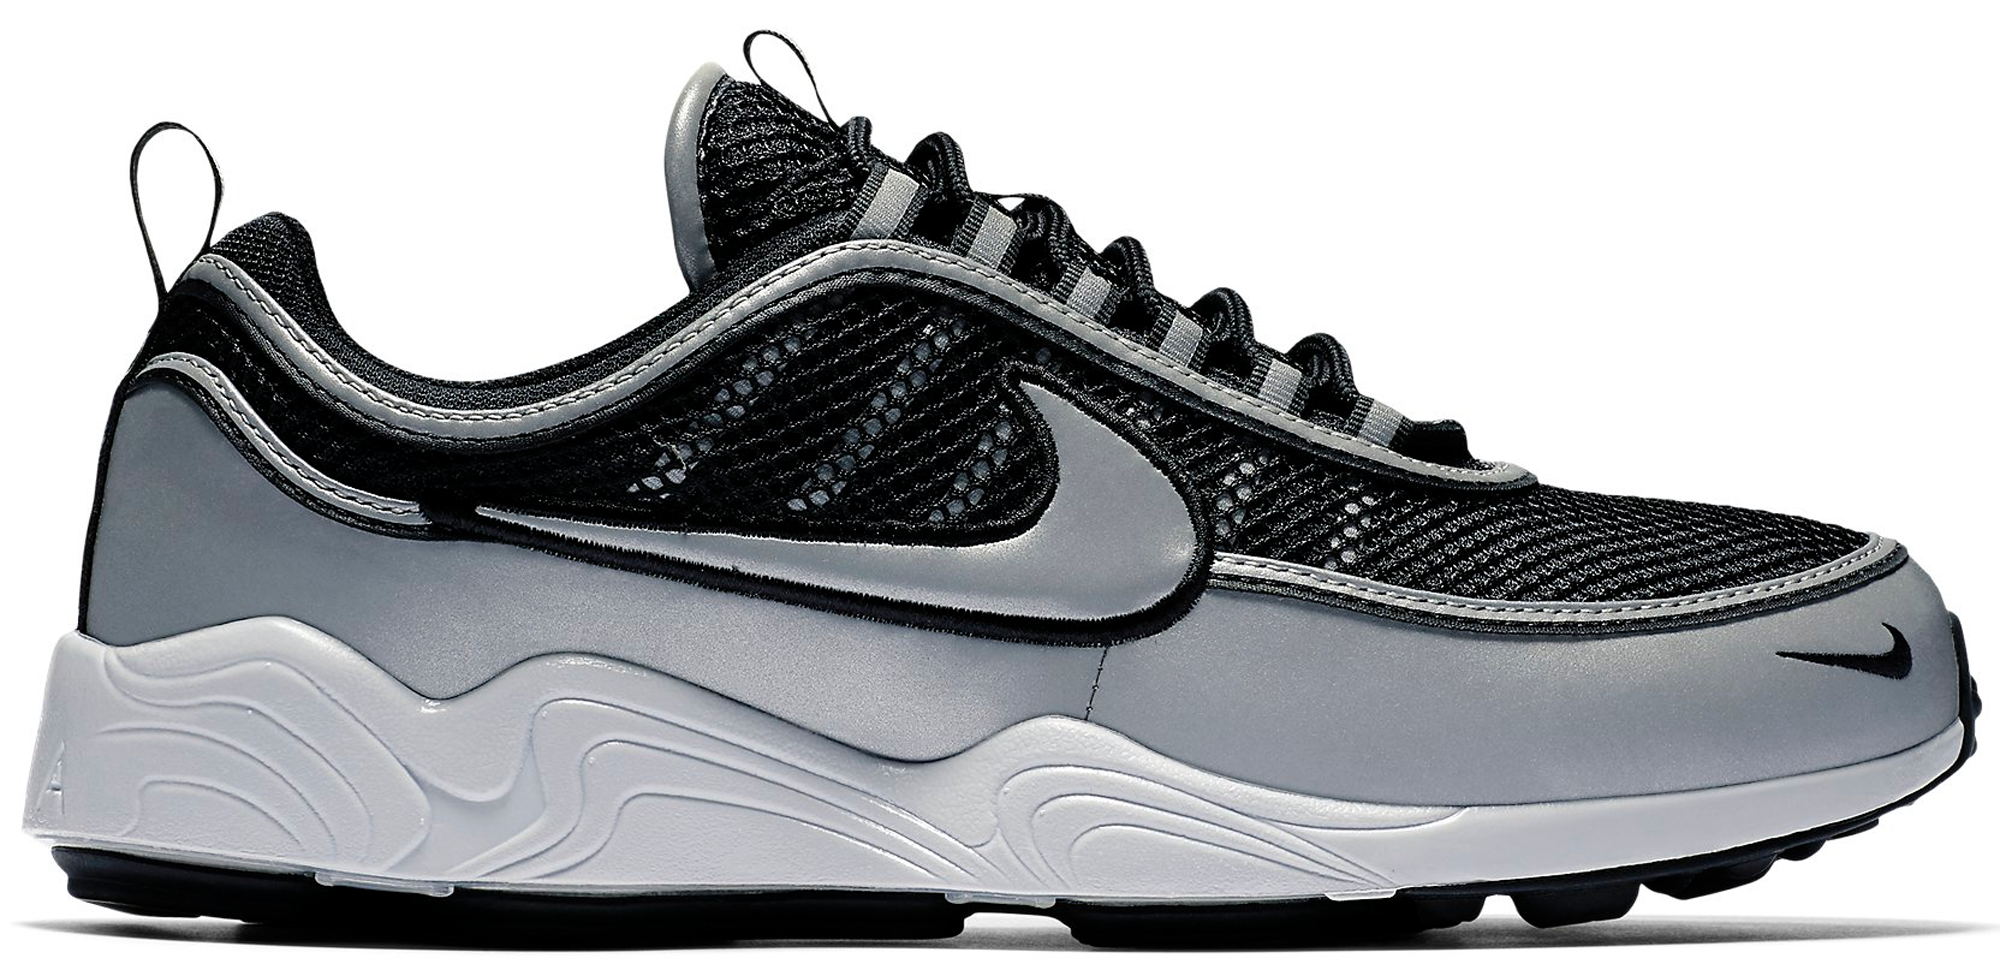 Nike Air Zoom Spiridon 16 Black Silver